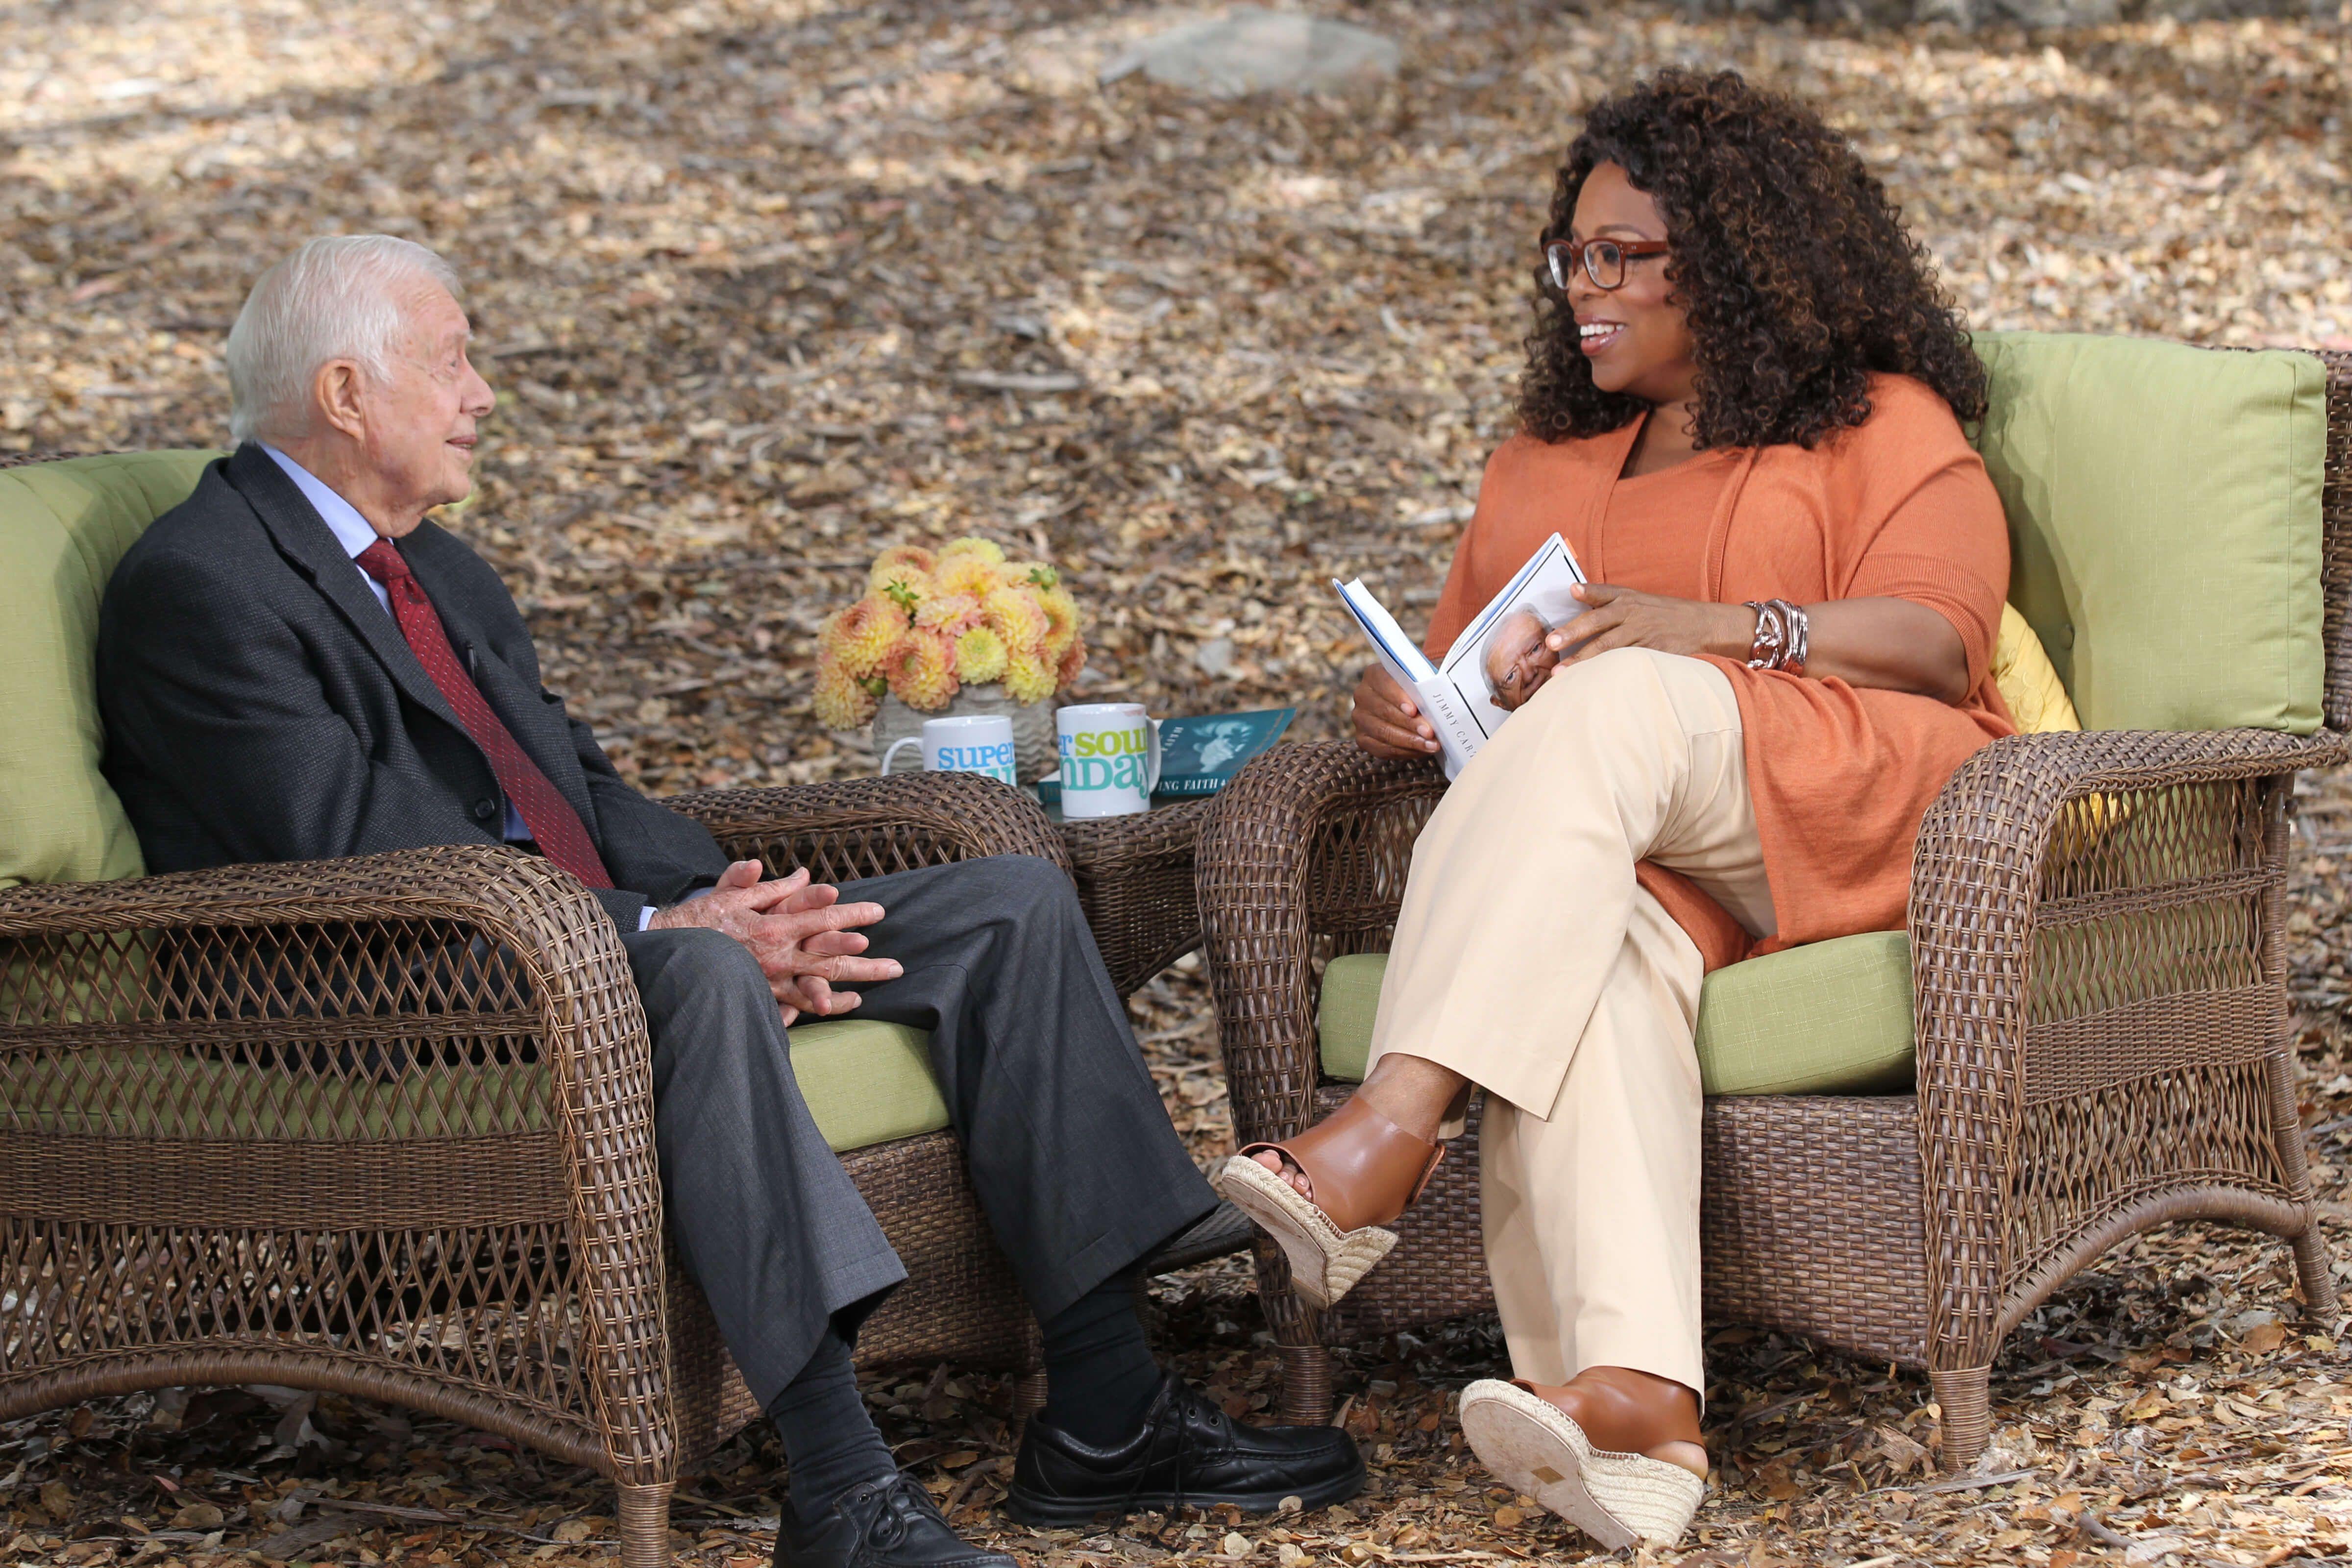 Опра Уинфри с бывшим президентом США Джимми Картером / supersoul.tv